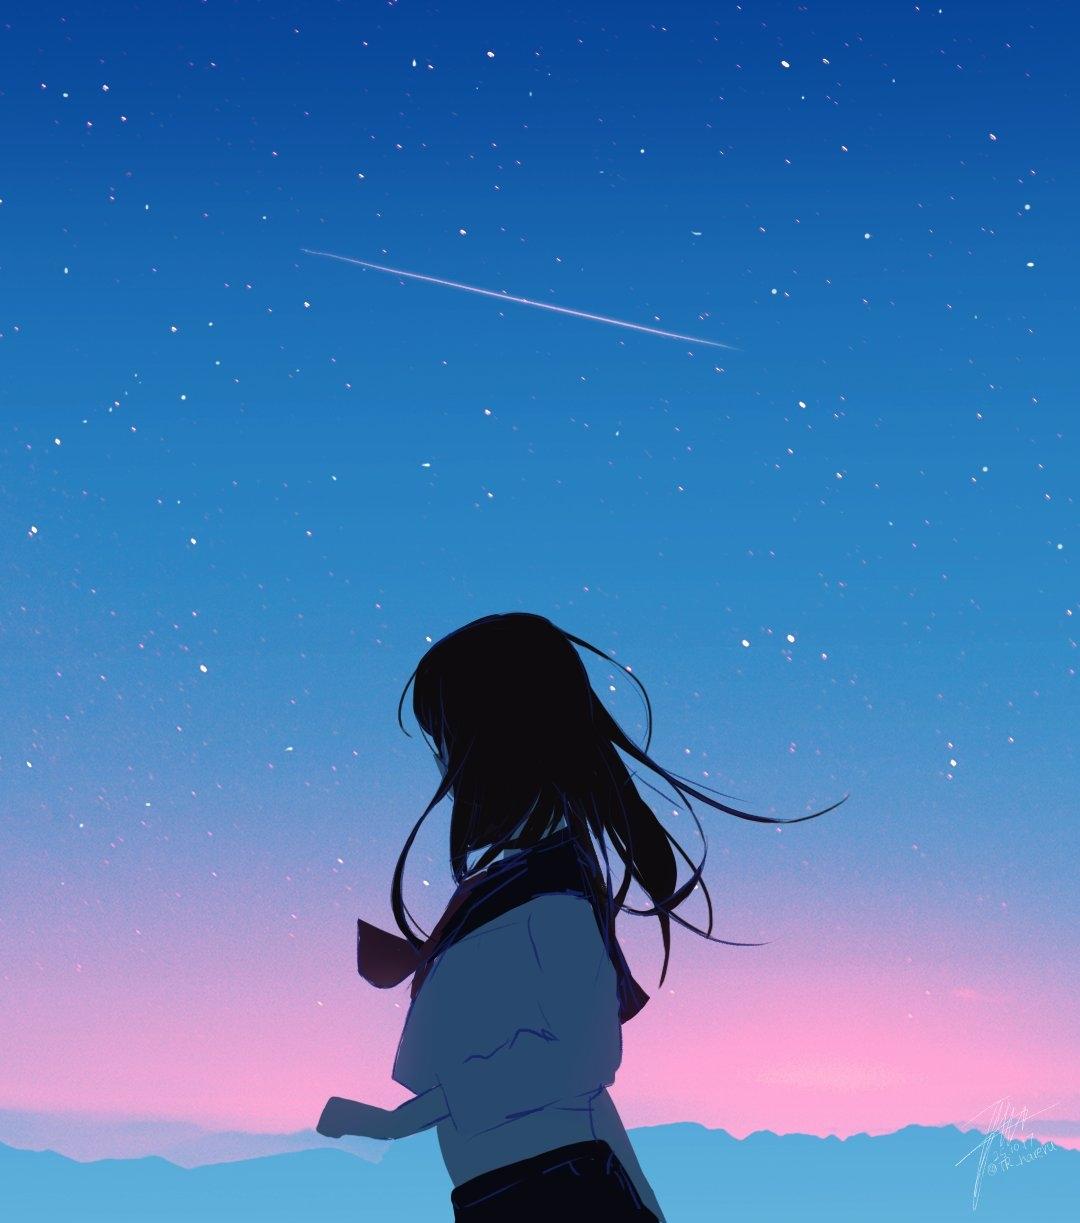 id=65595759,唯美星空壁纸,动漫女生图片,动漫唯美壁纸